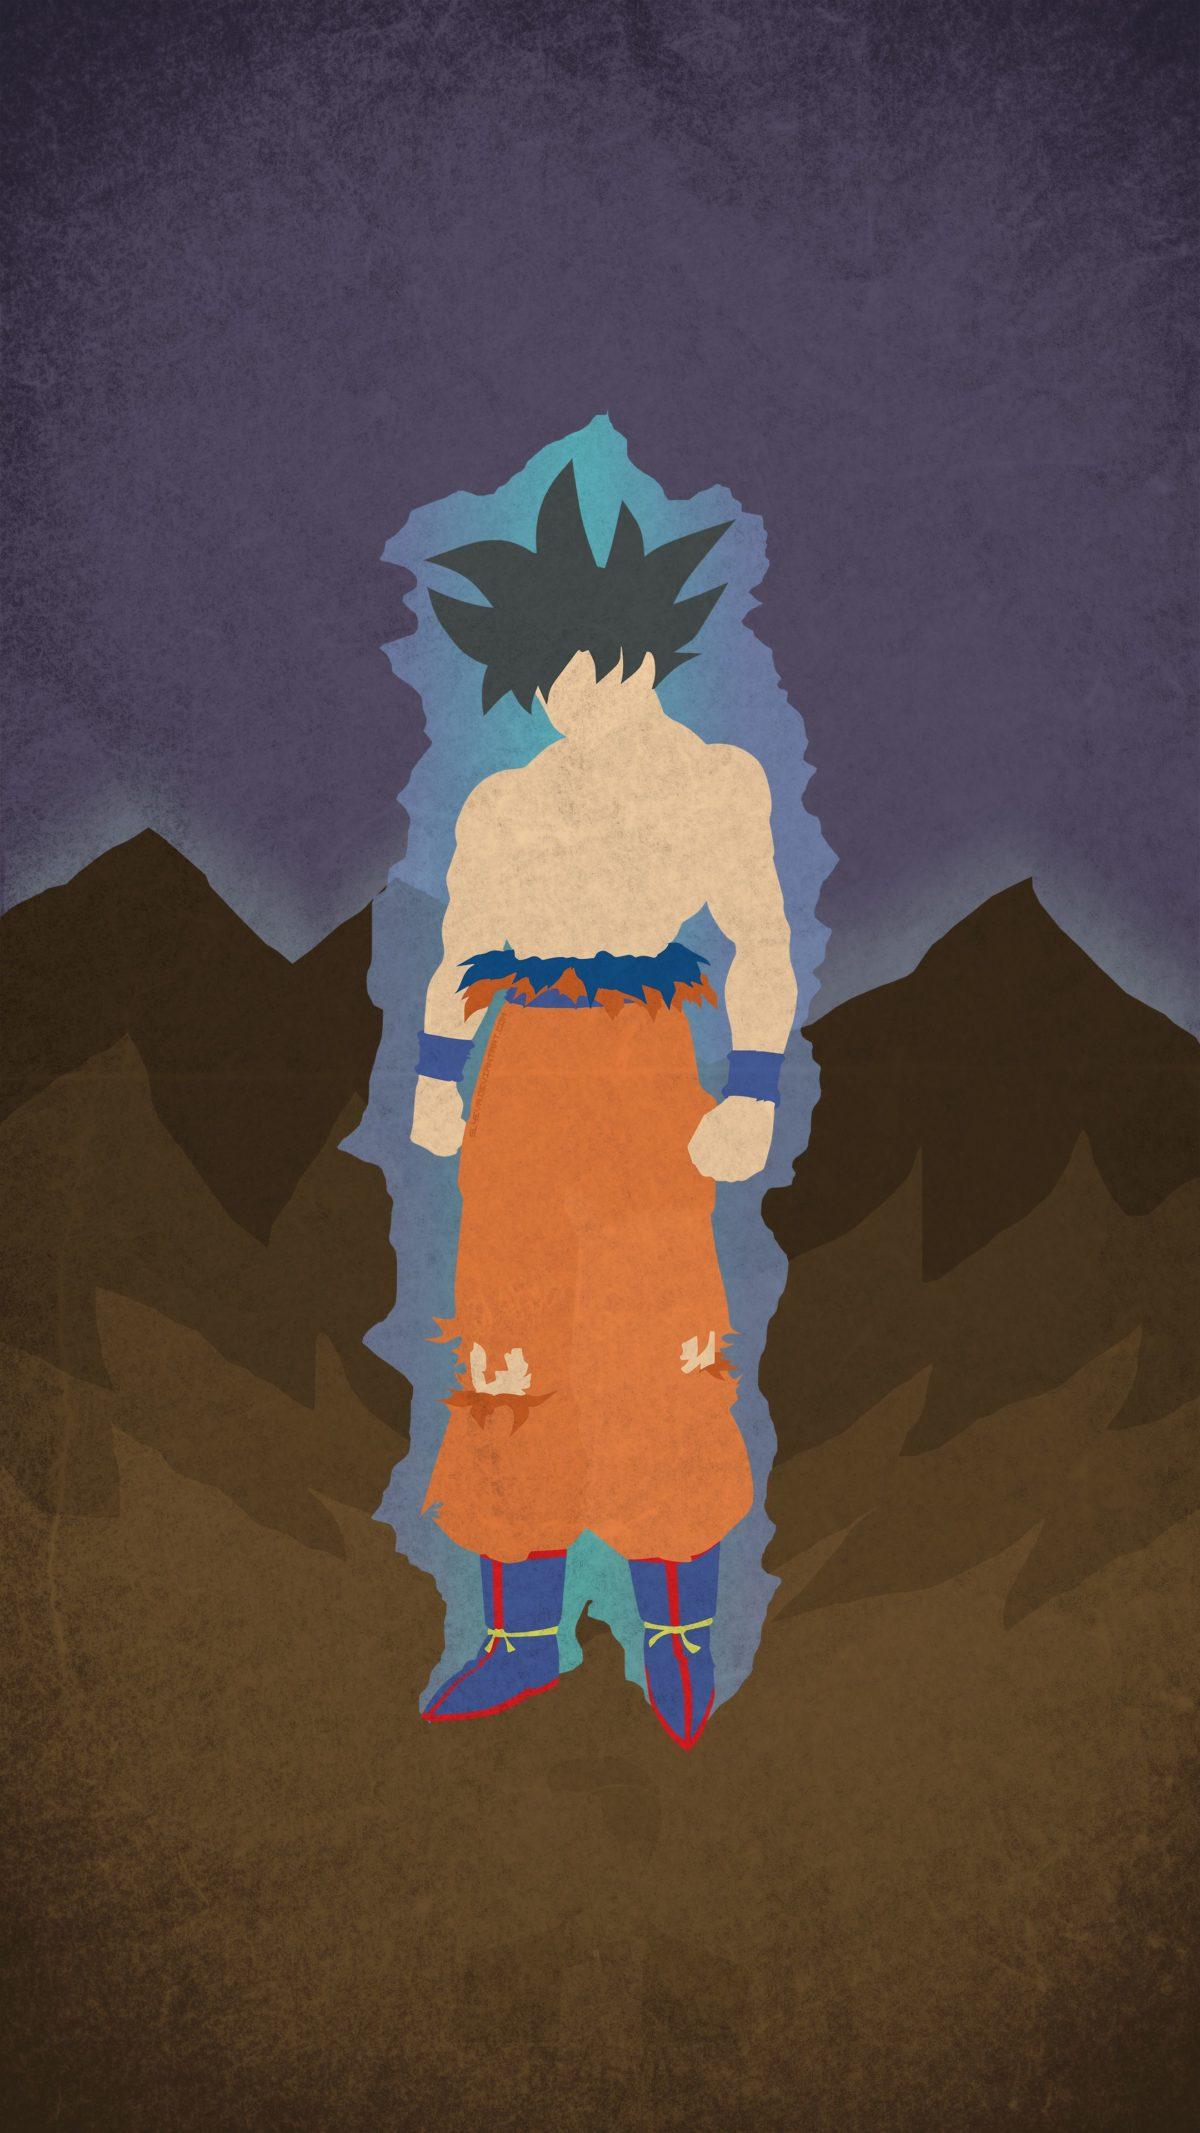 Ultra Instinct Goku Minimal Mobile Wallpaper – Imgur